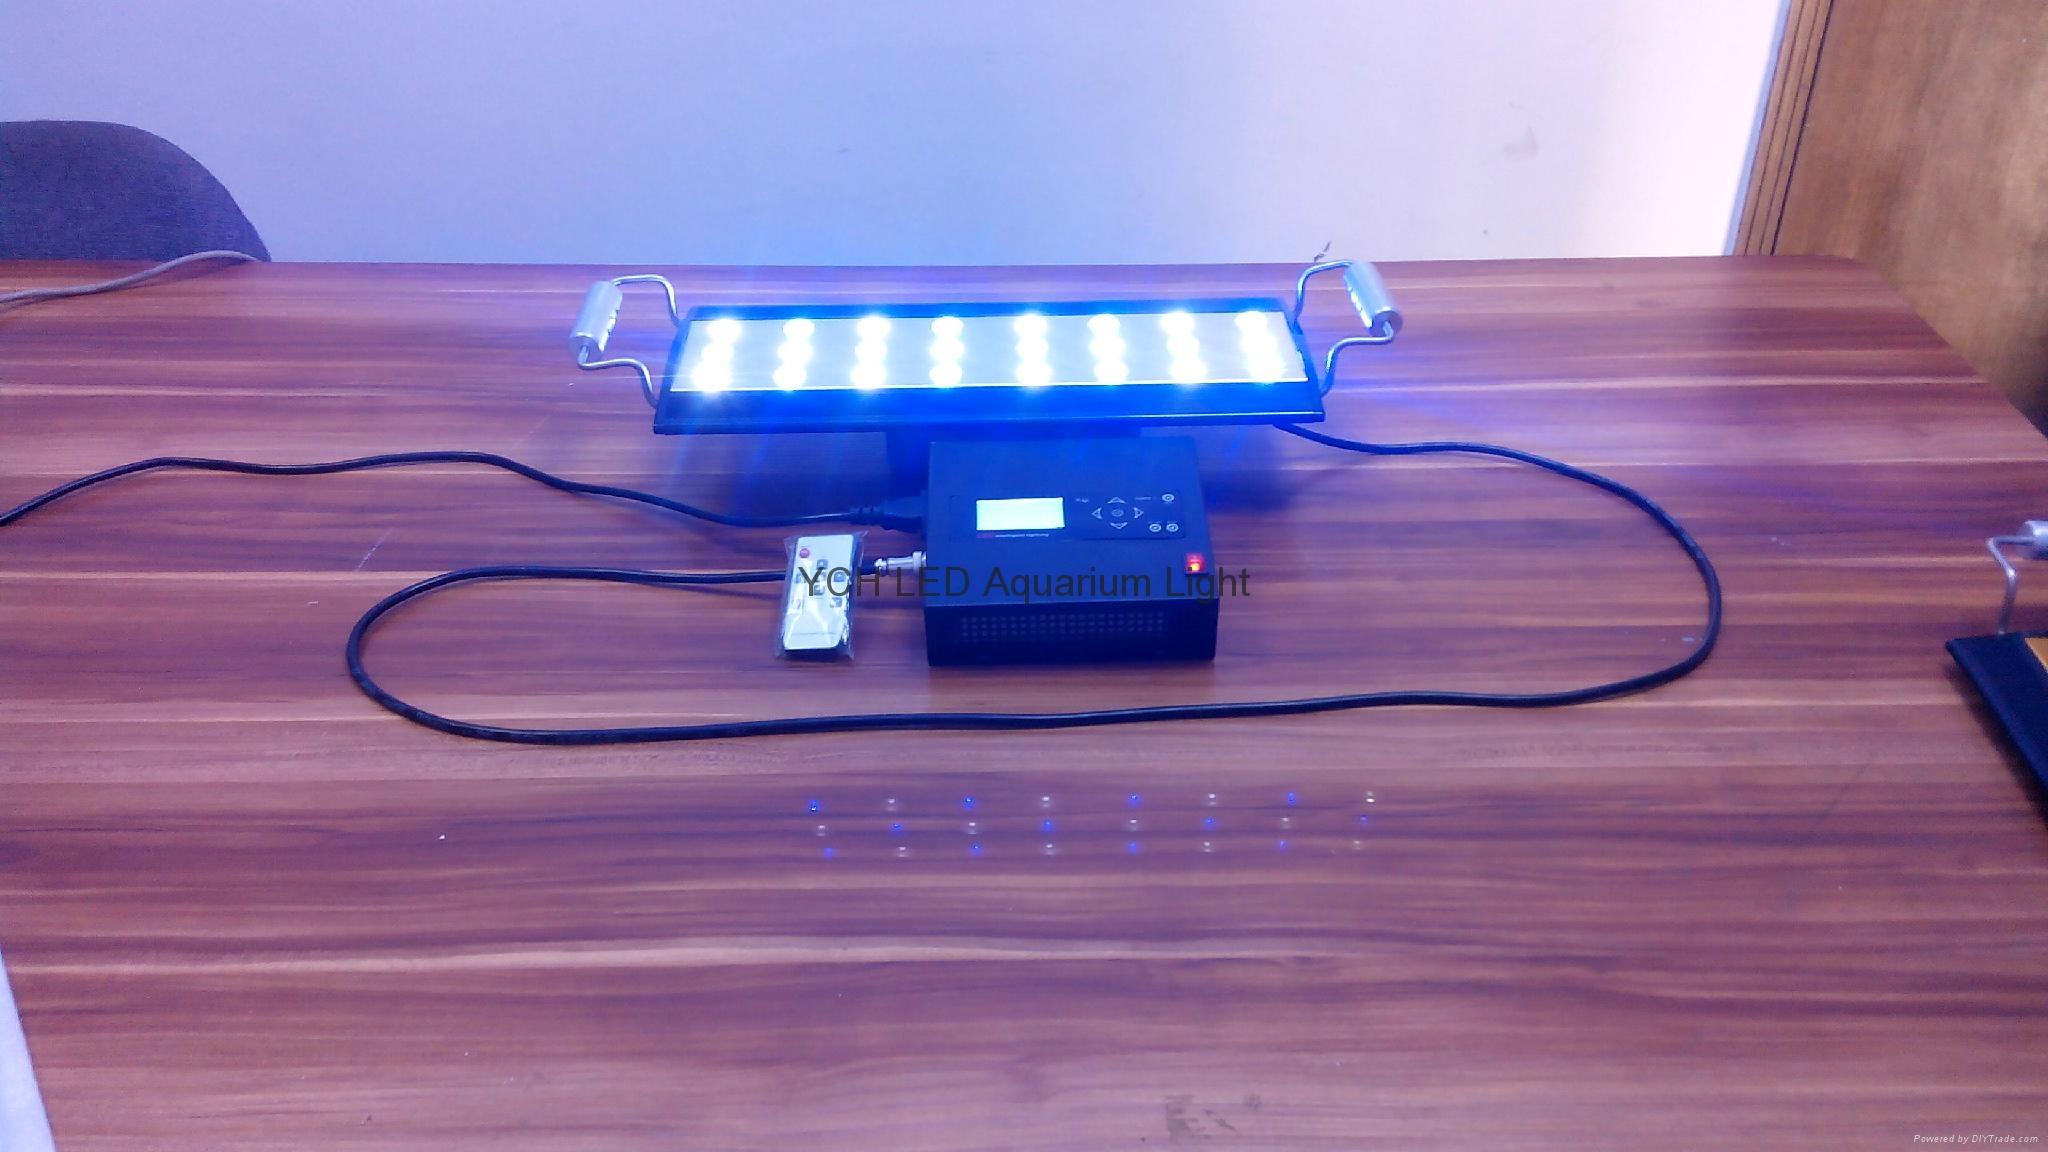 72W Flying Fish LED Aquarium Light 5